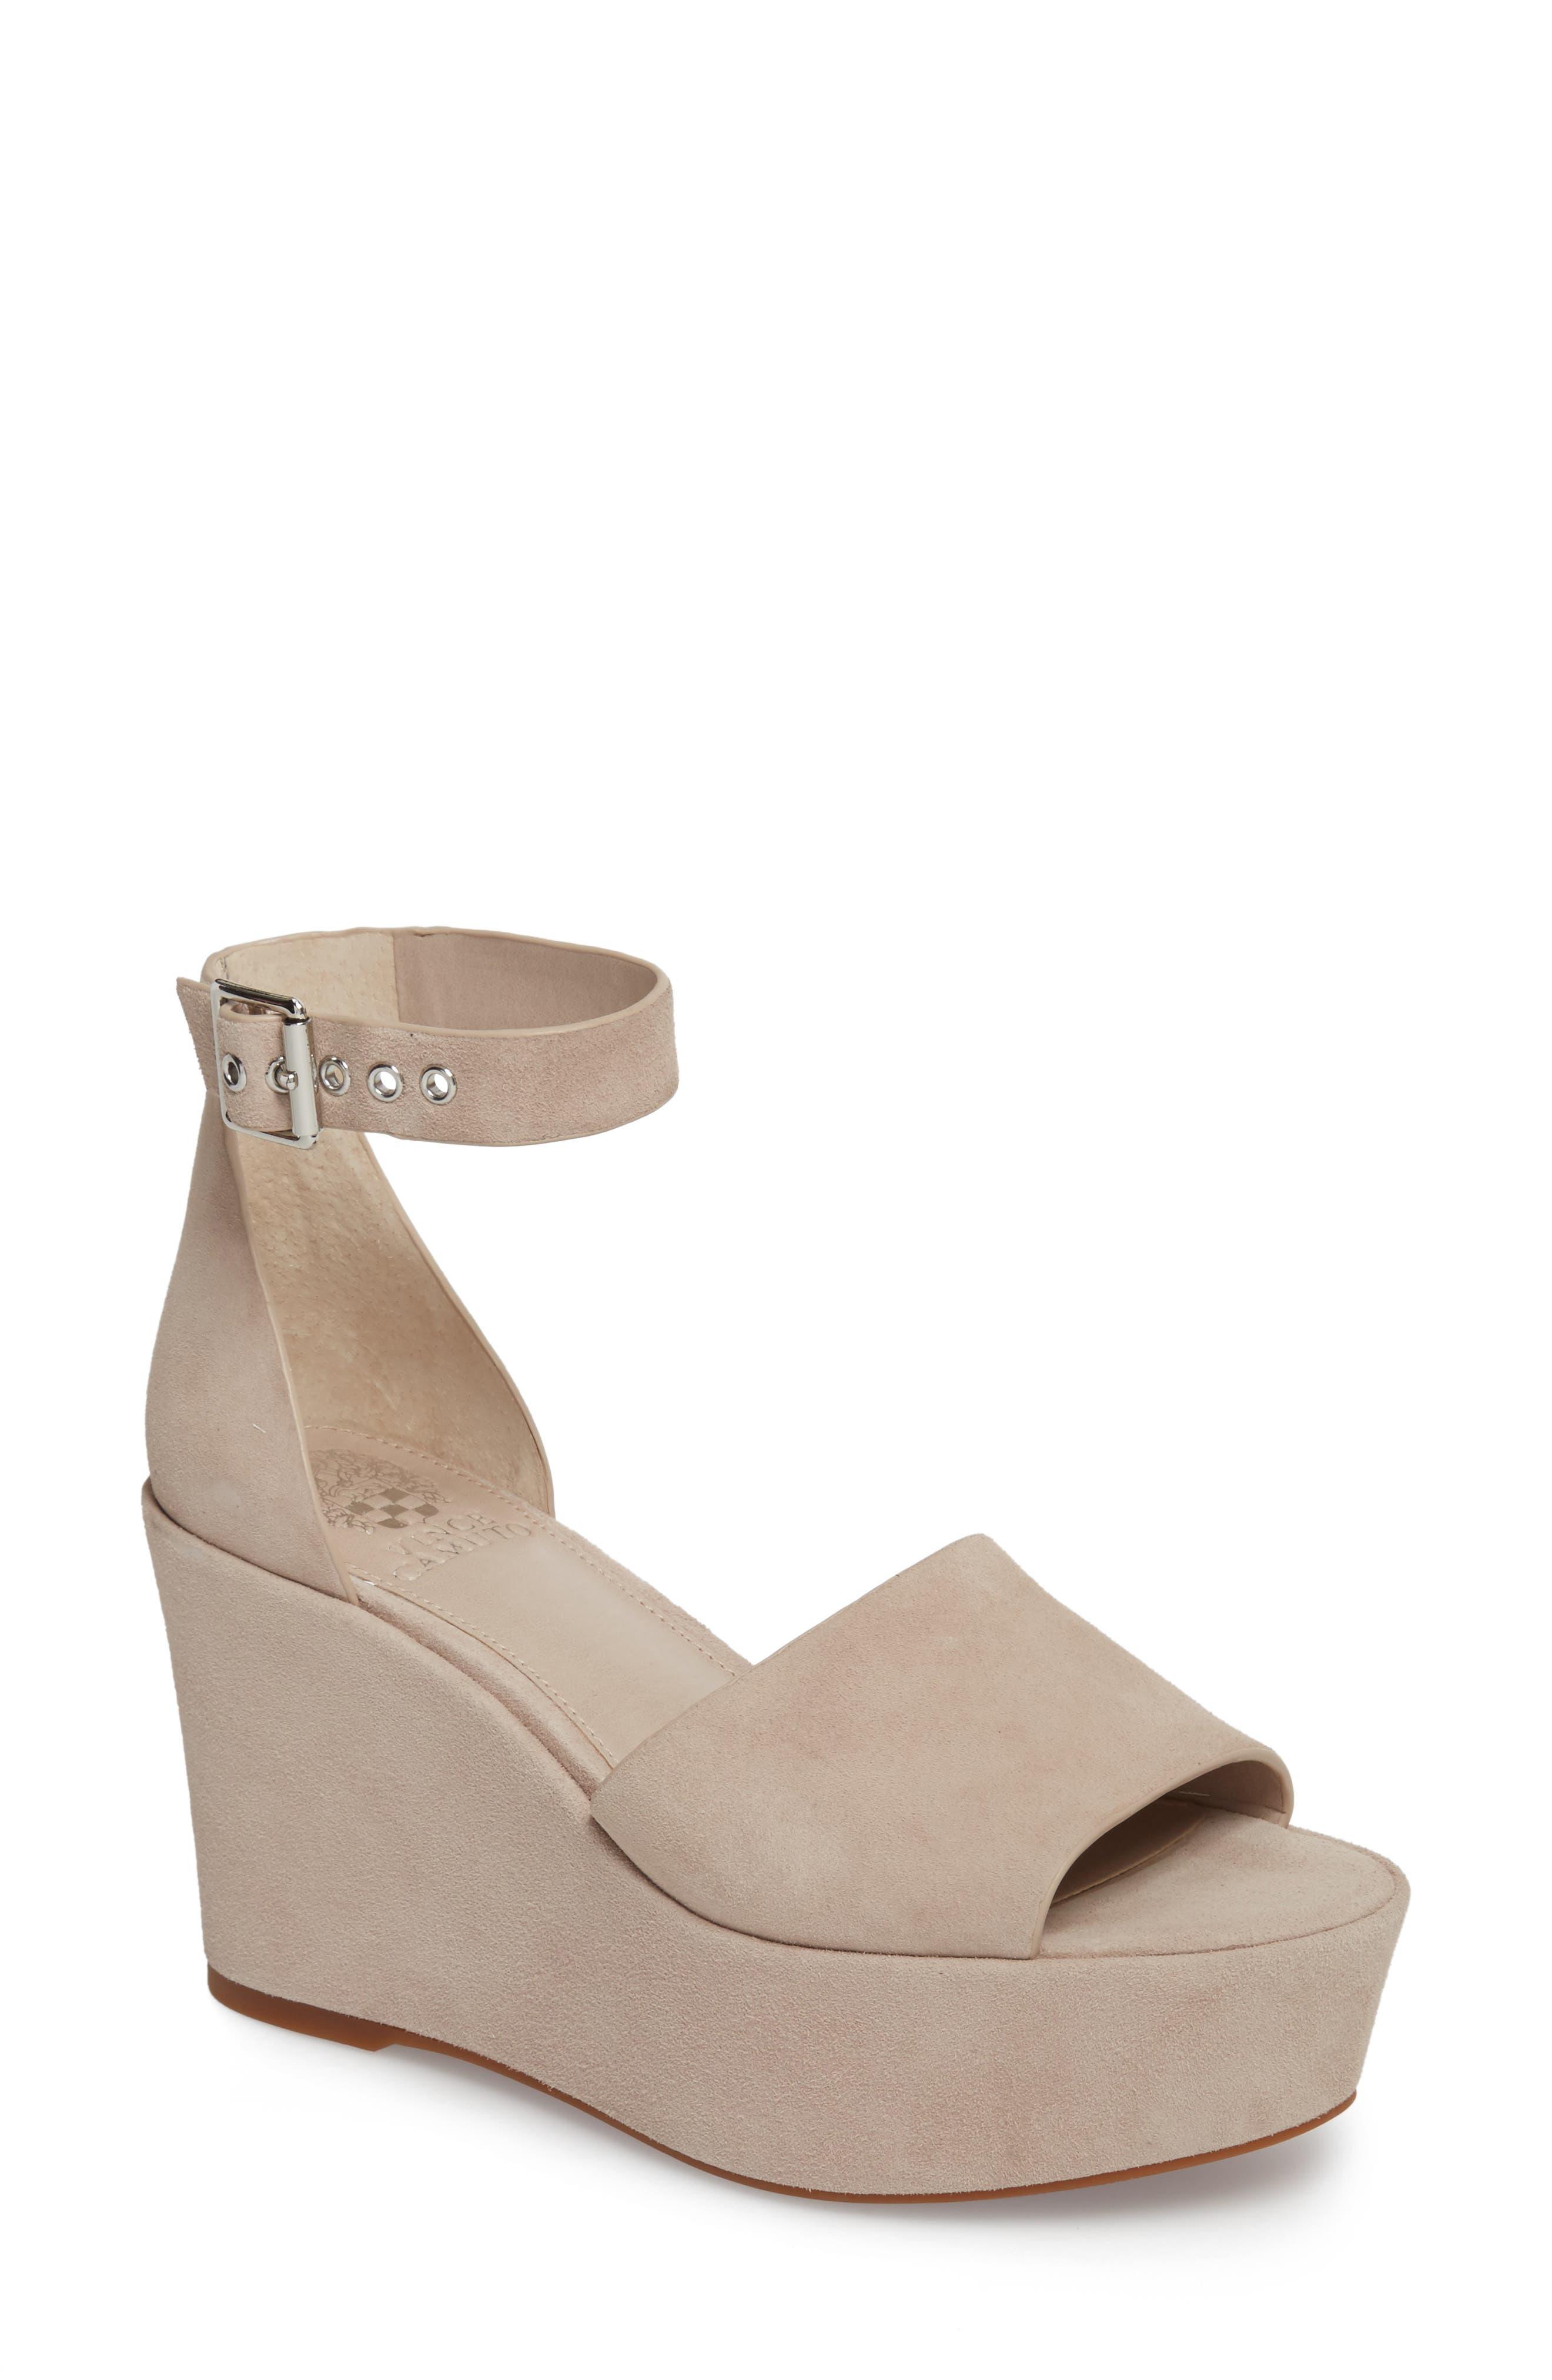 Korista Platform Sandal,                             Main thumbnail 1, color,                             Tipsy Taupe Suede